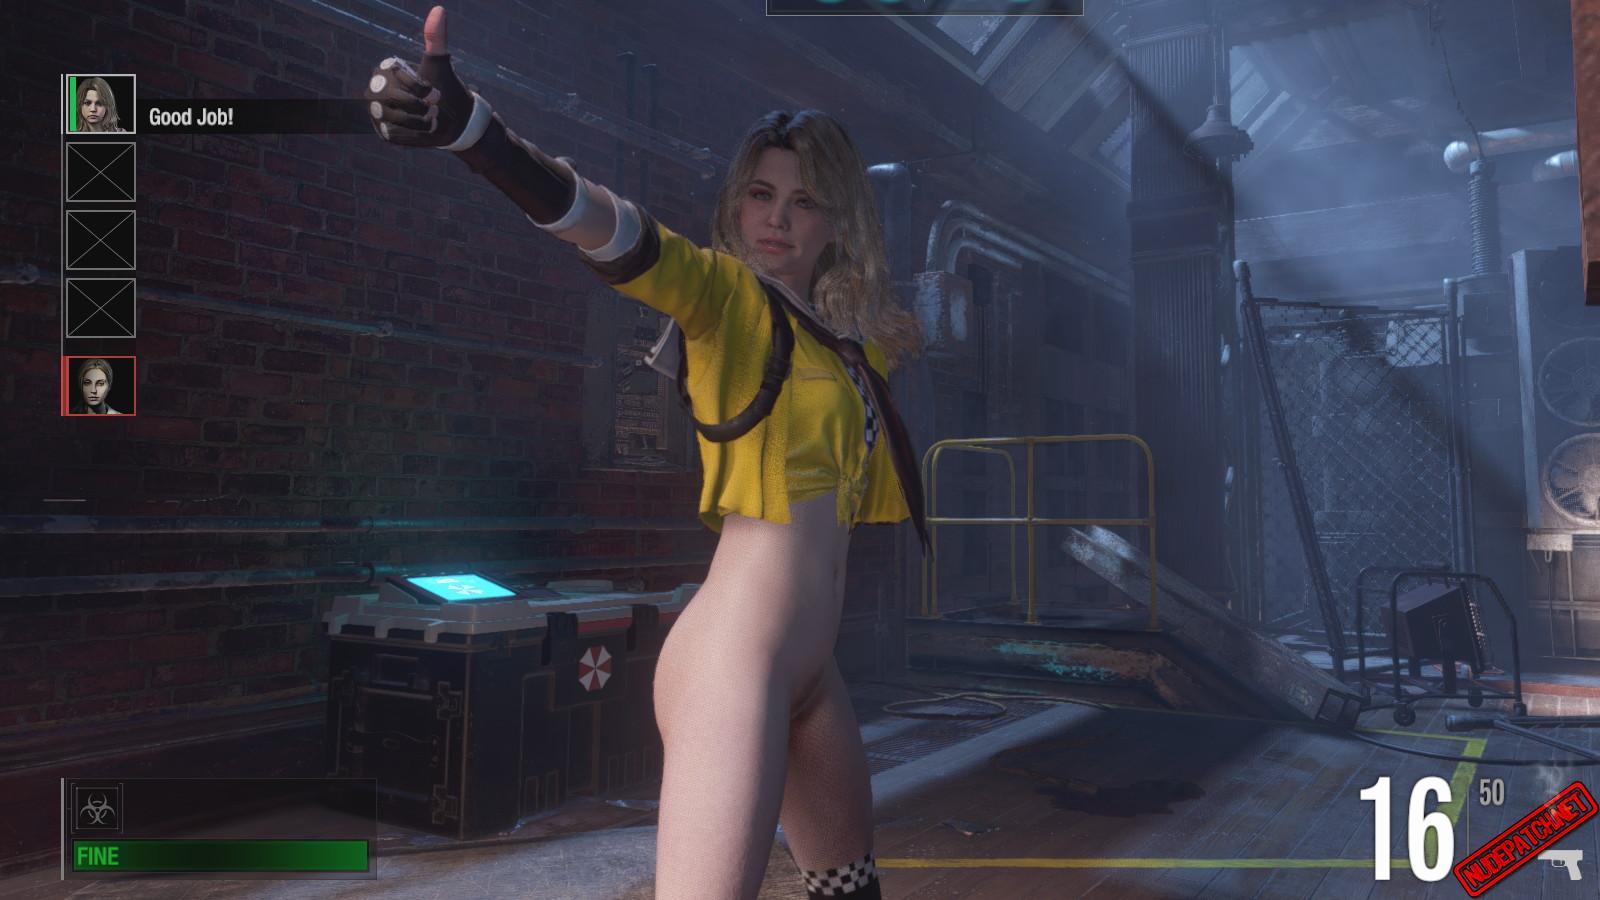 Resident Evil: Resistance Nude Mod